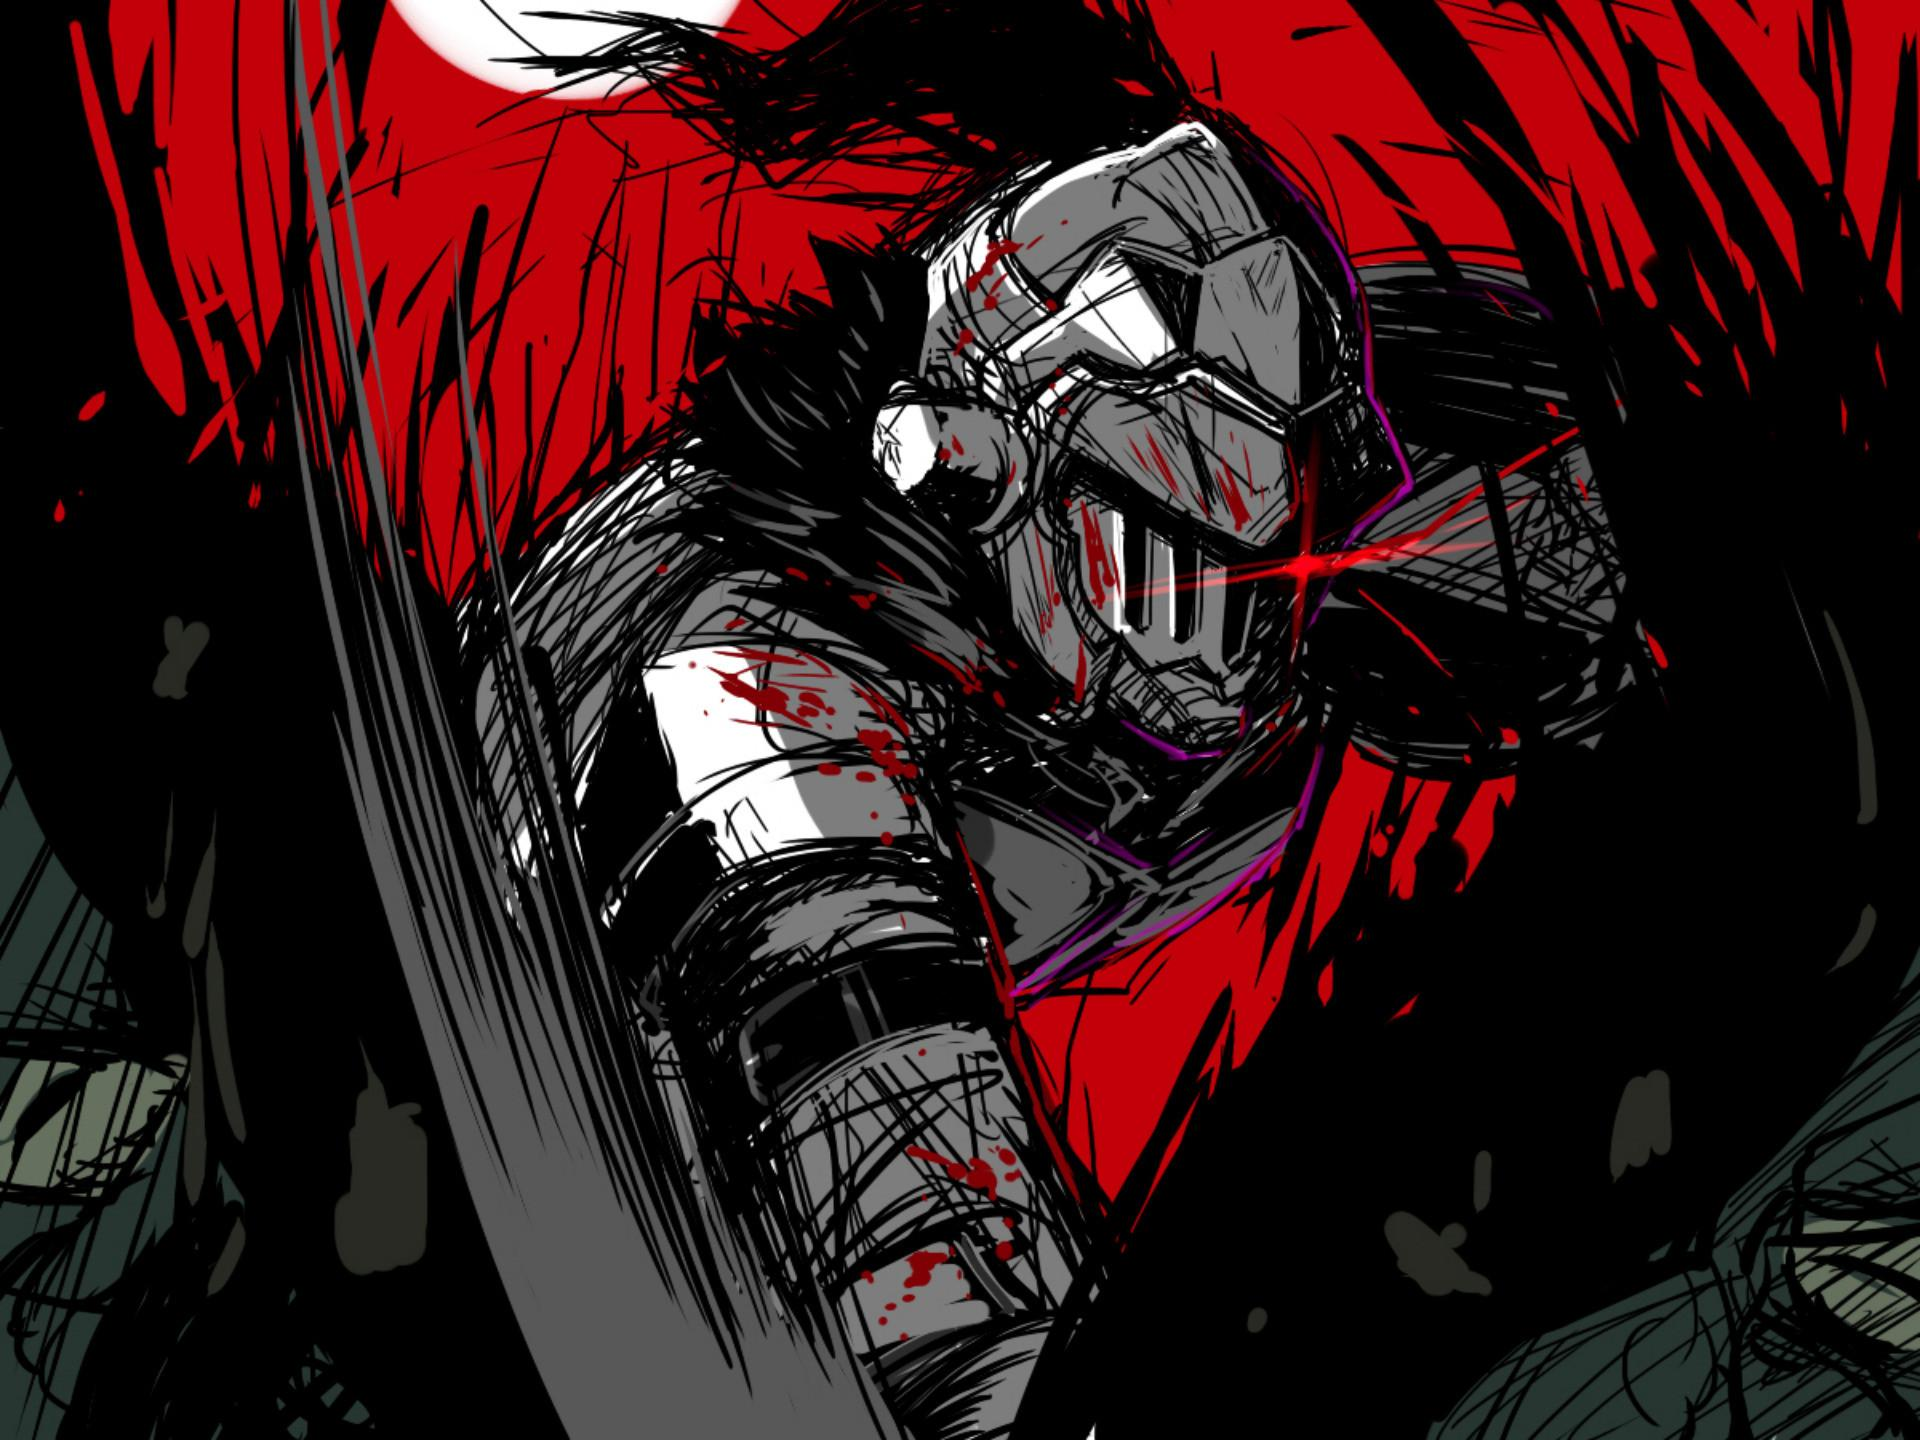 Demon Slayer Computer Wallpapers - Wallpaper Cave